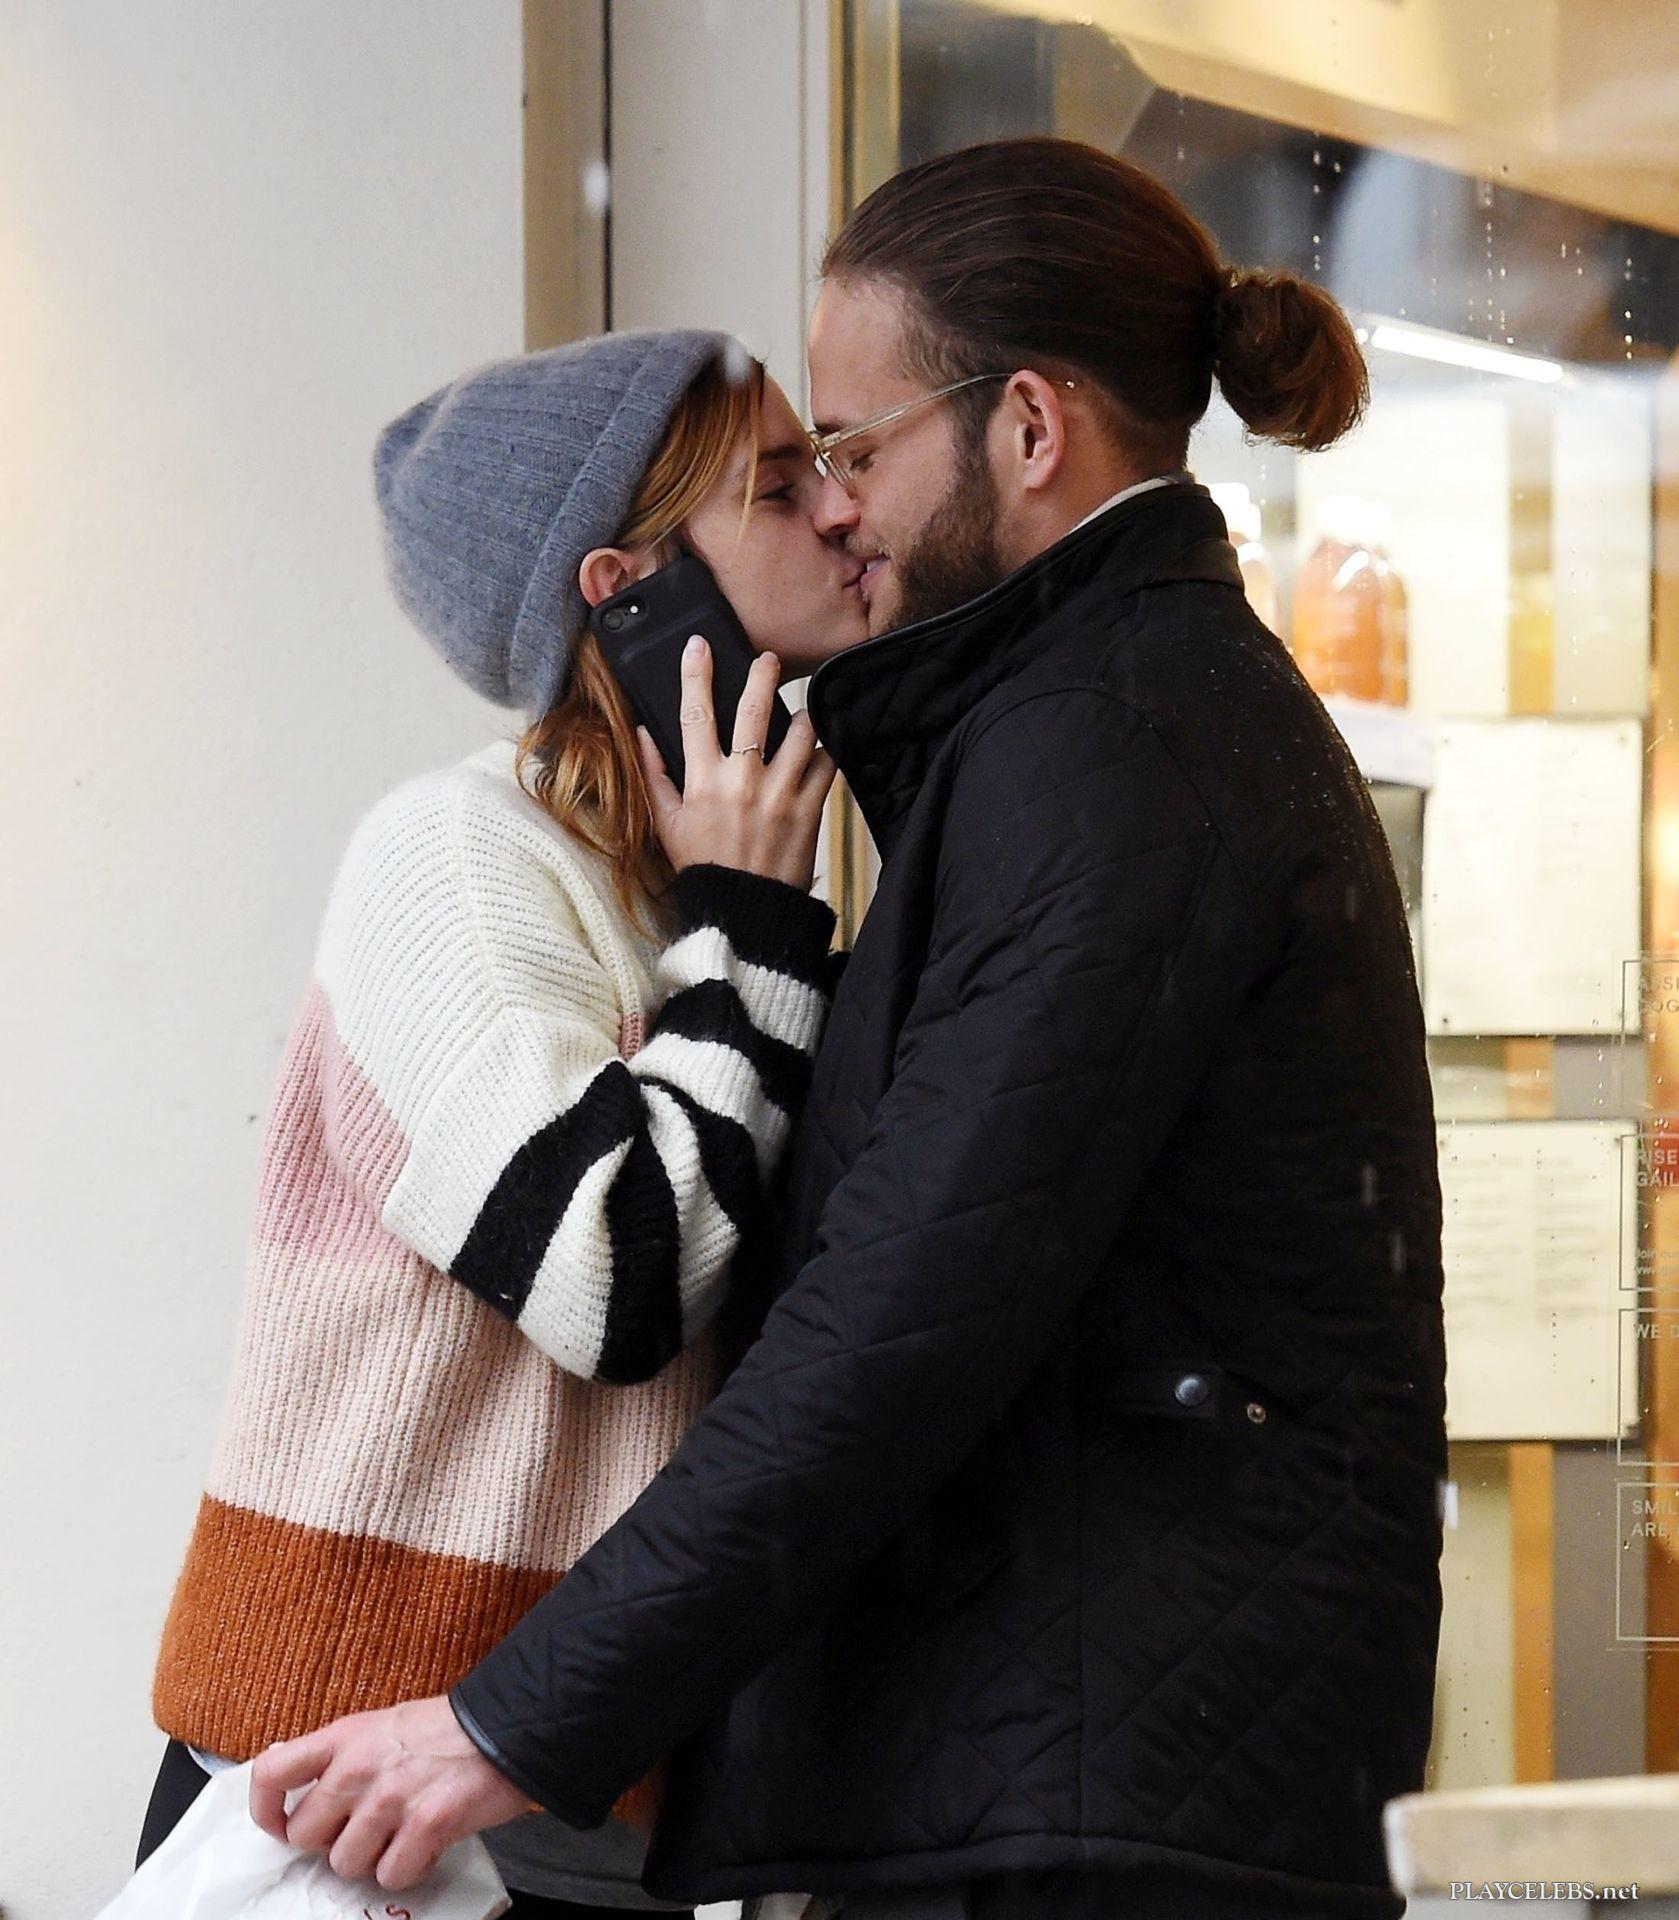 Emma Watson Hot French Kiss On Public